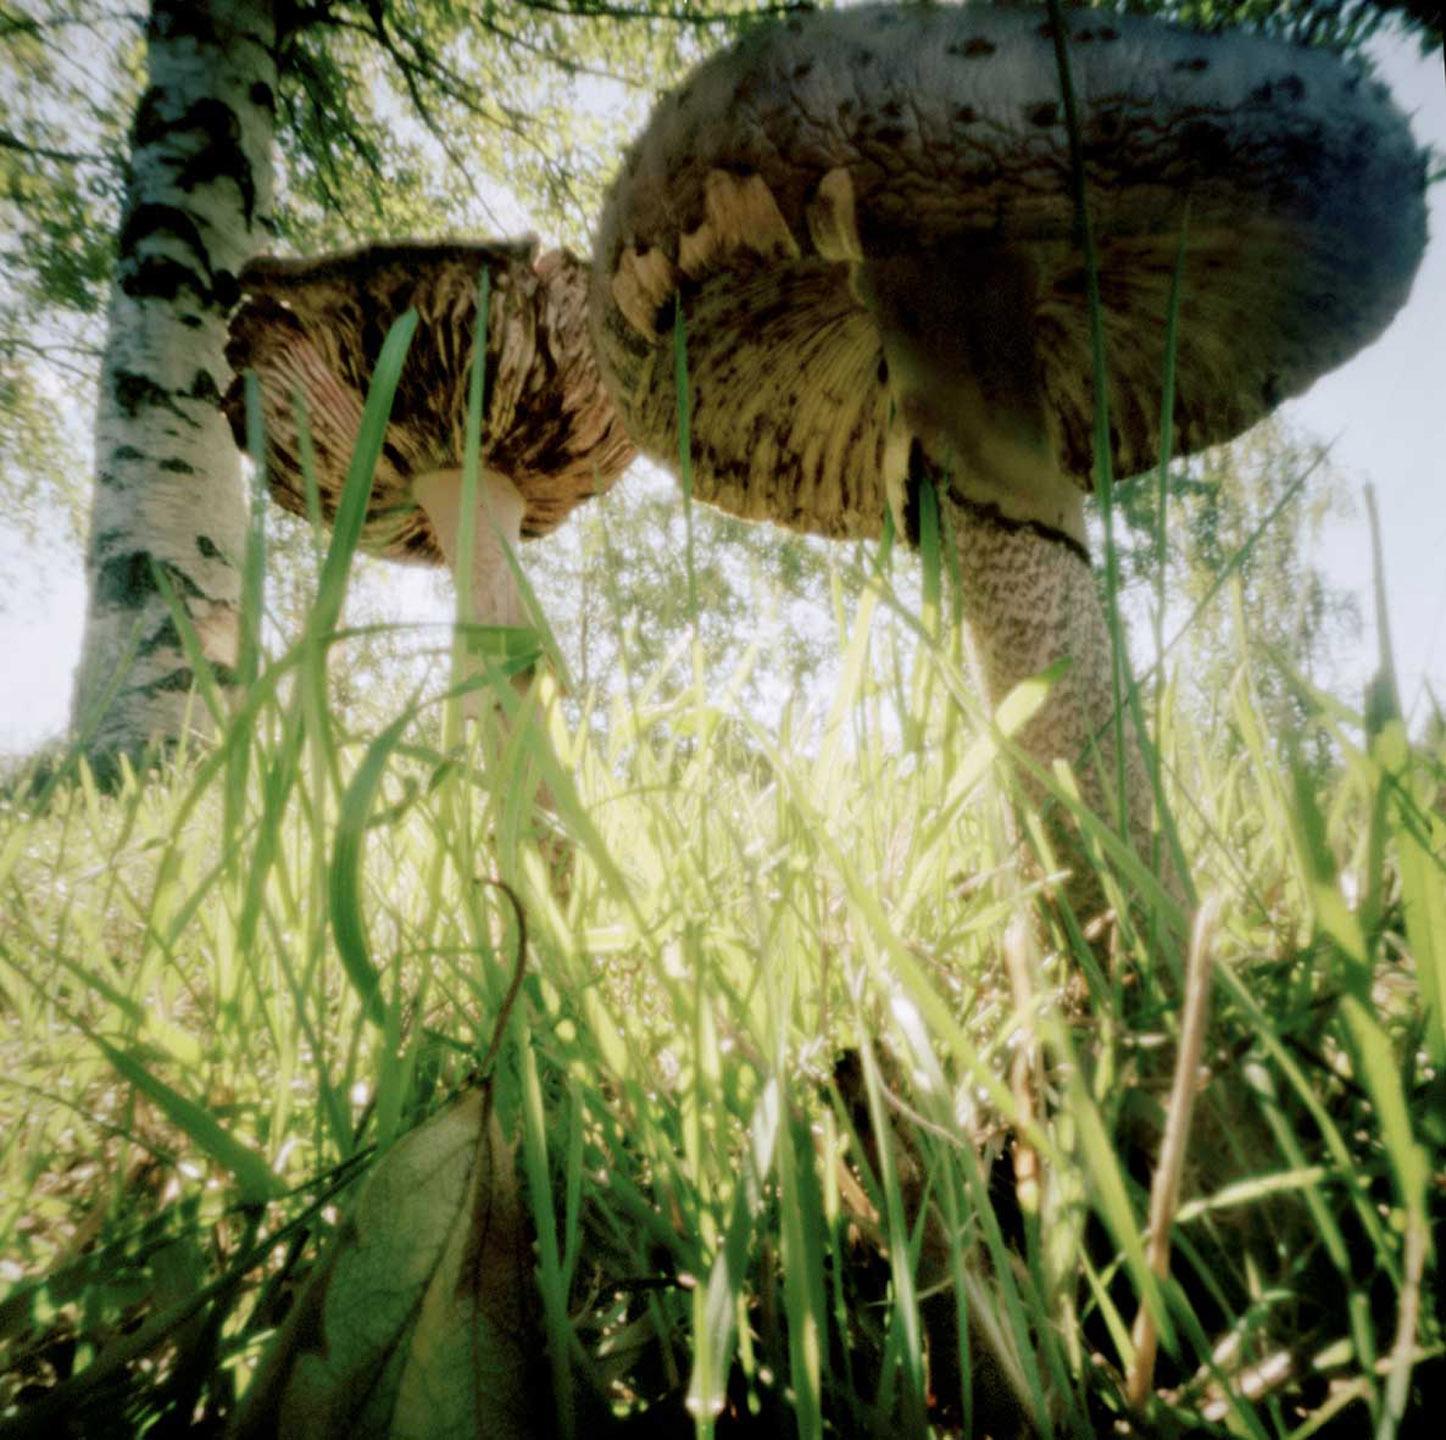 Nadege_Mushrooms